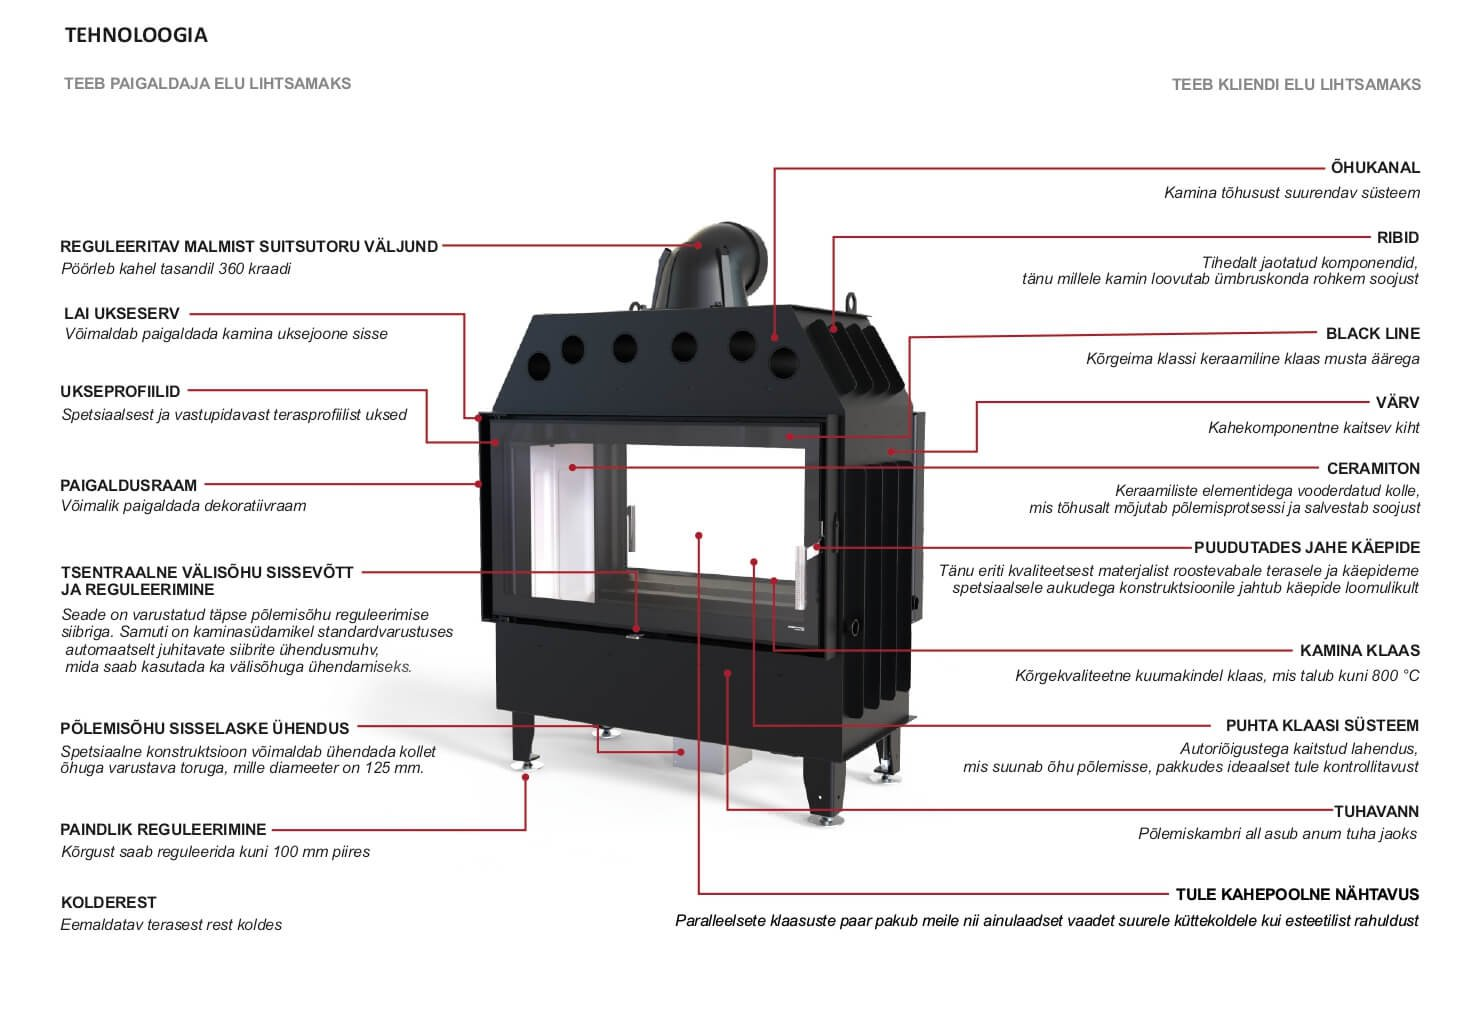 Defro Home Kaminasüdamik Intra T tehnoloogia